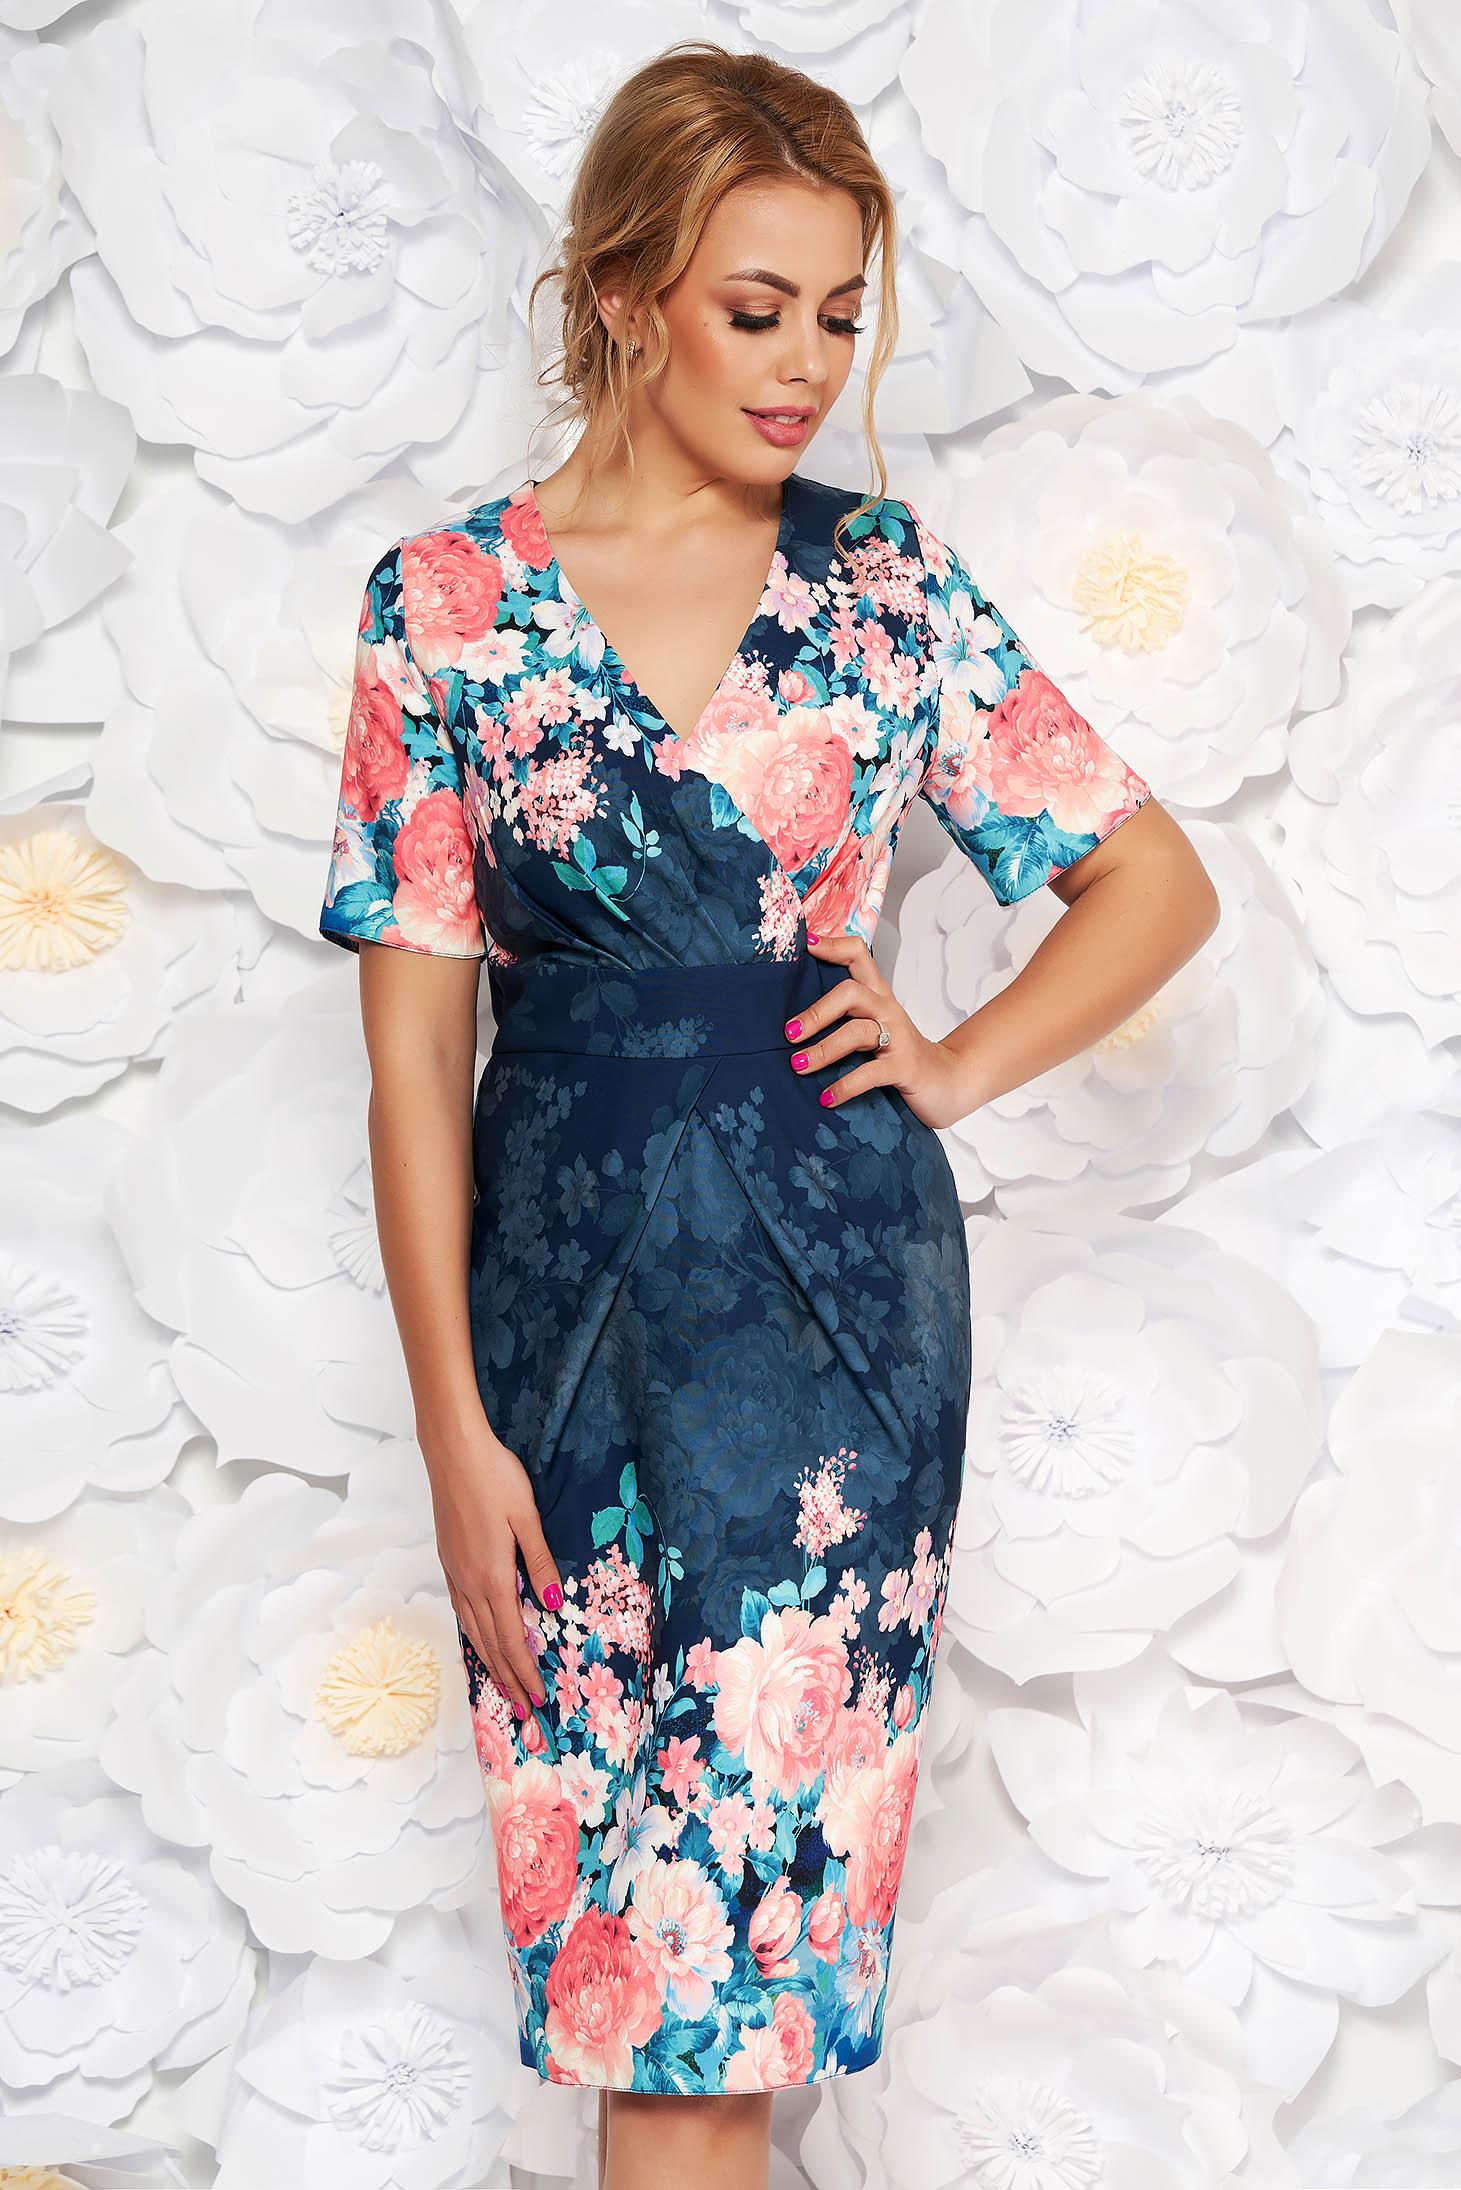 Rochie albastra-inchis eleganta tip creion cu decolteu in v din material usor elastic cu imprimeu floral